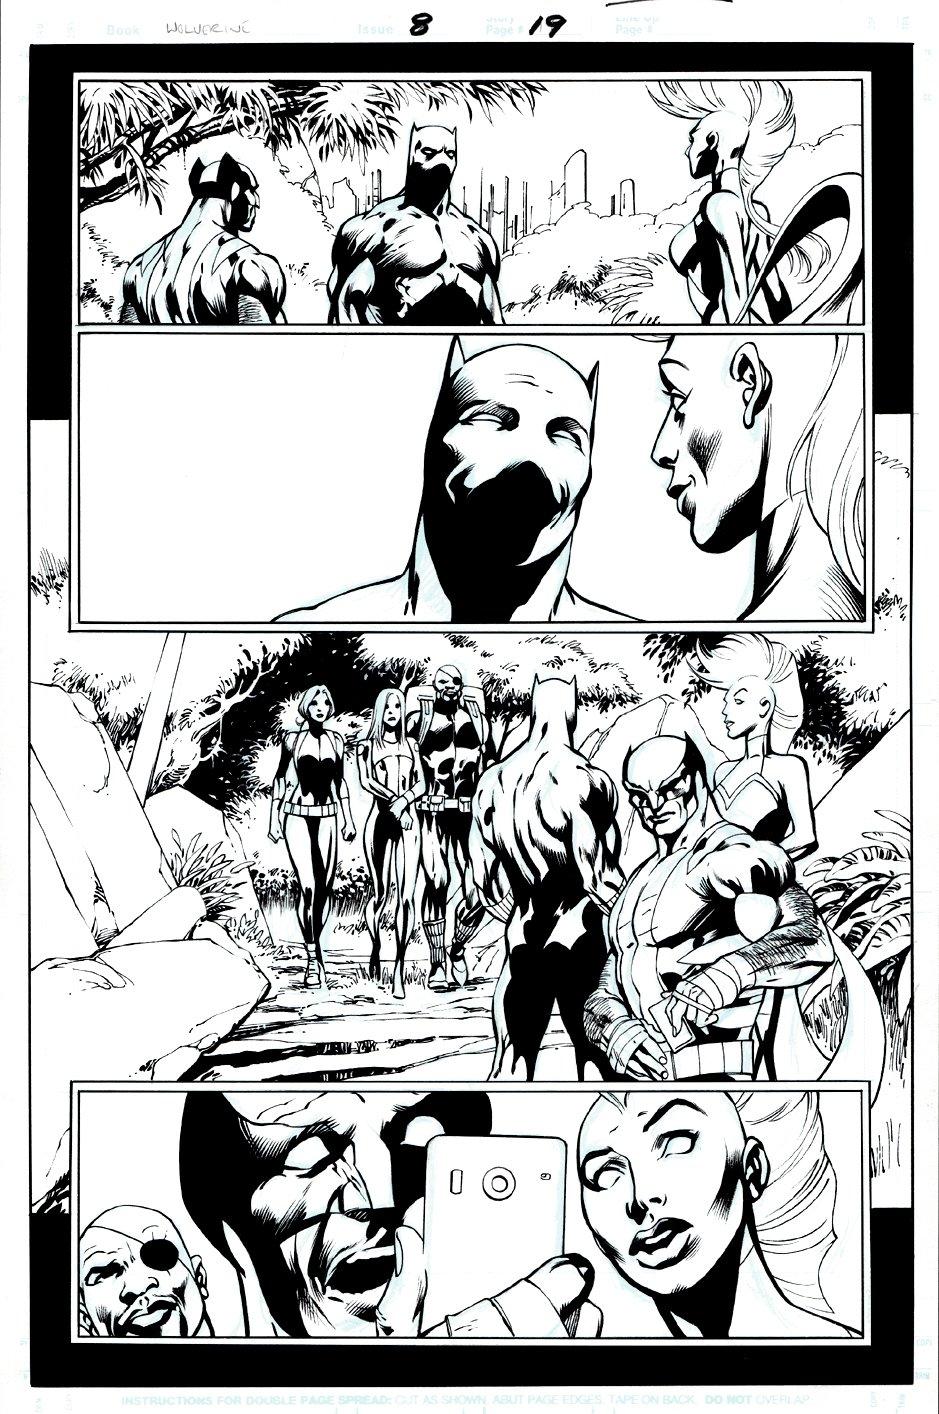 Wolverine #8 p 19 (Wolverine, Black Panther, Storm, Nick Fury!) 2013